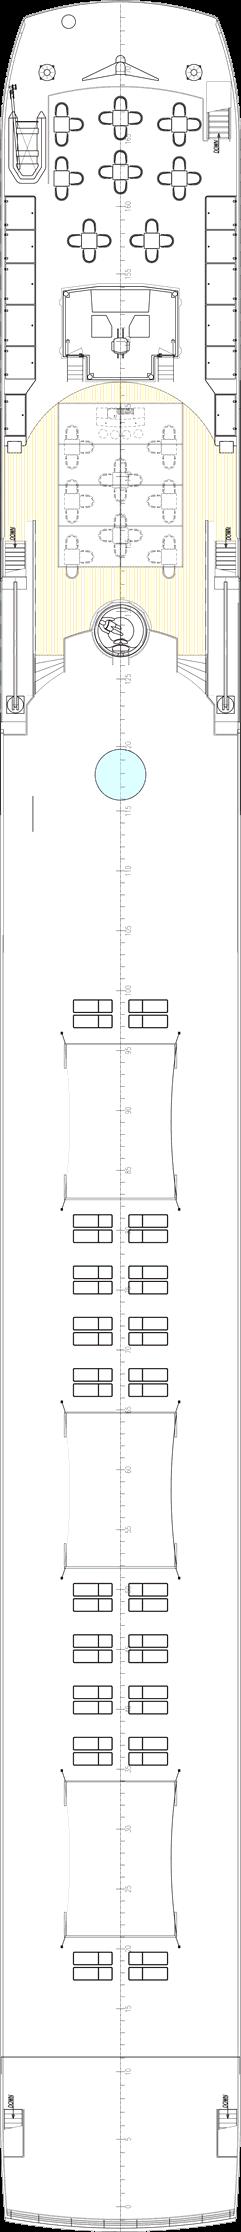 Avalon Imagery II: Sky Deck